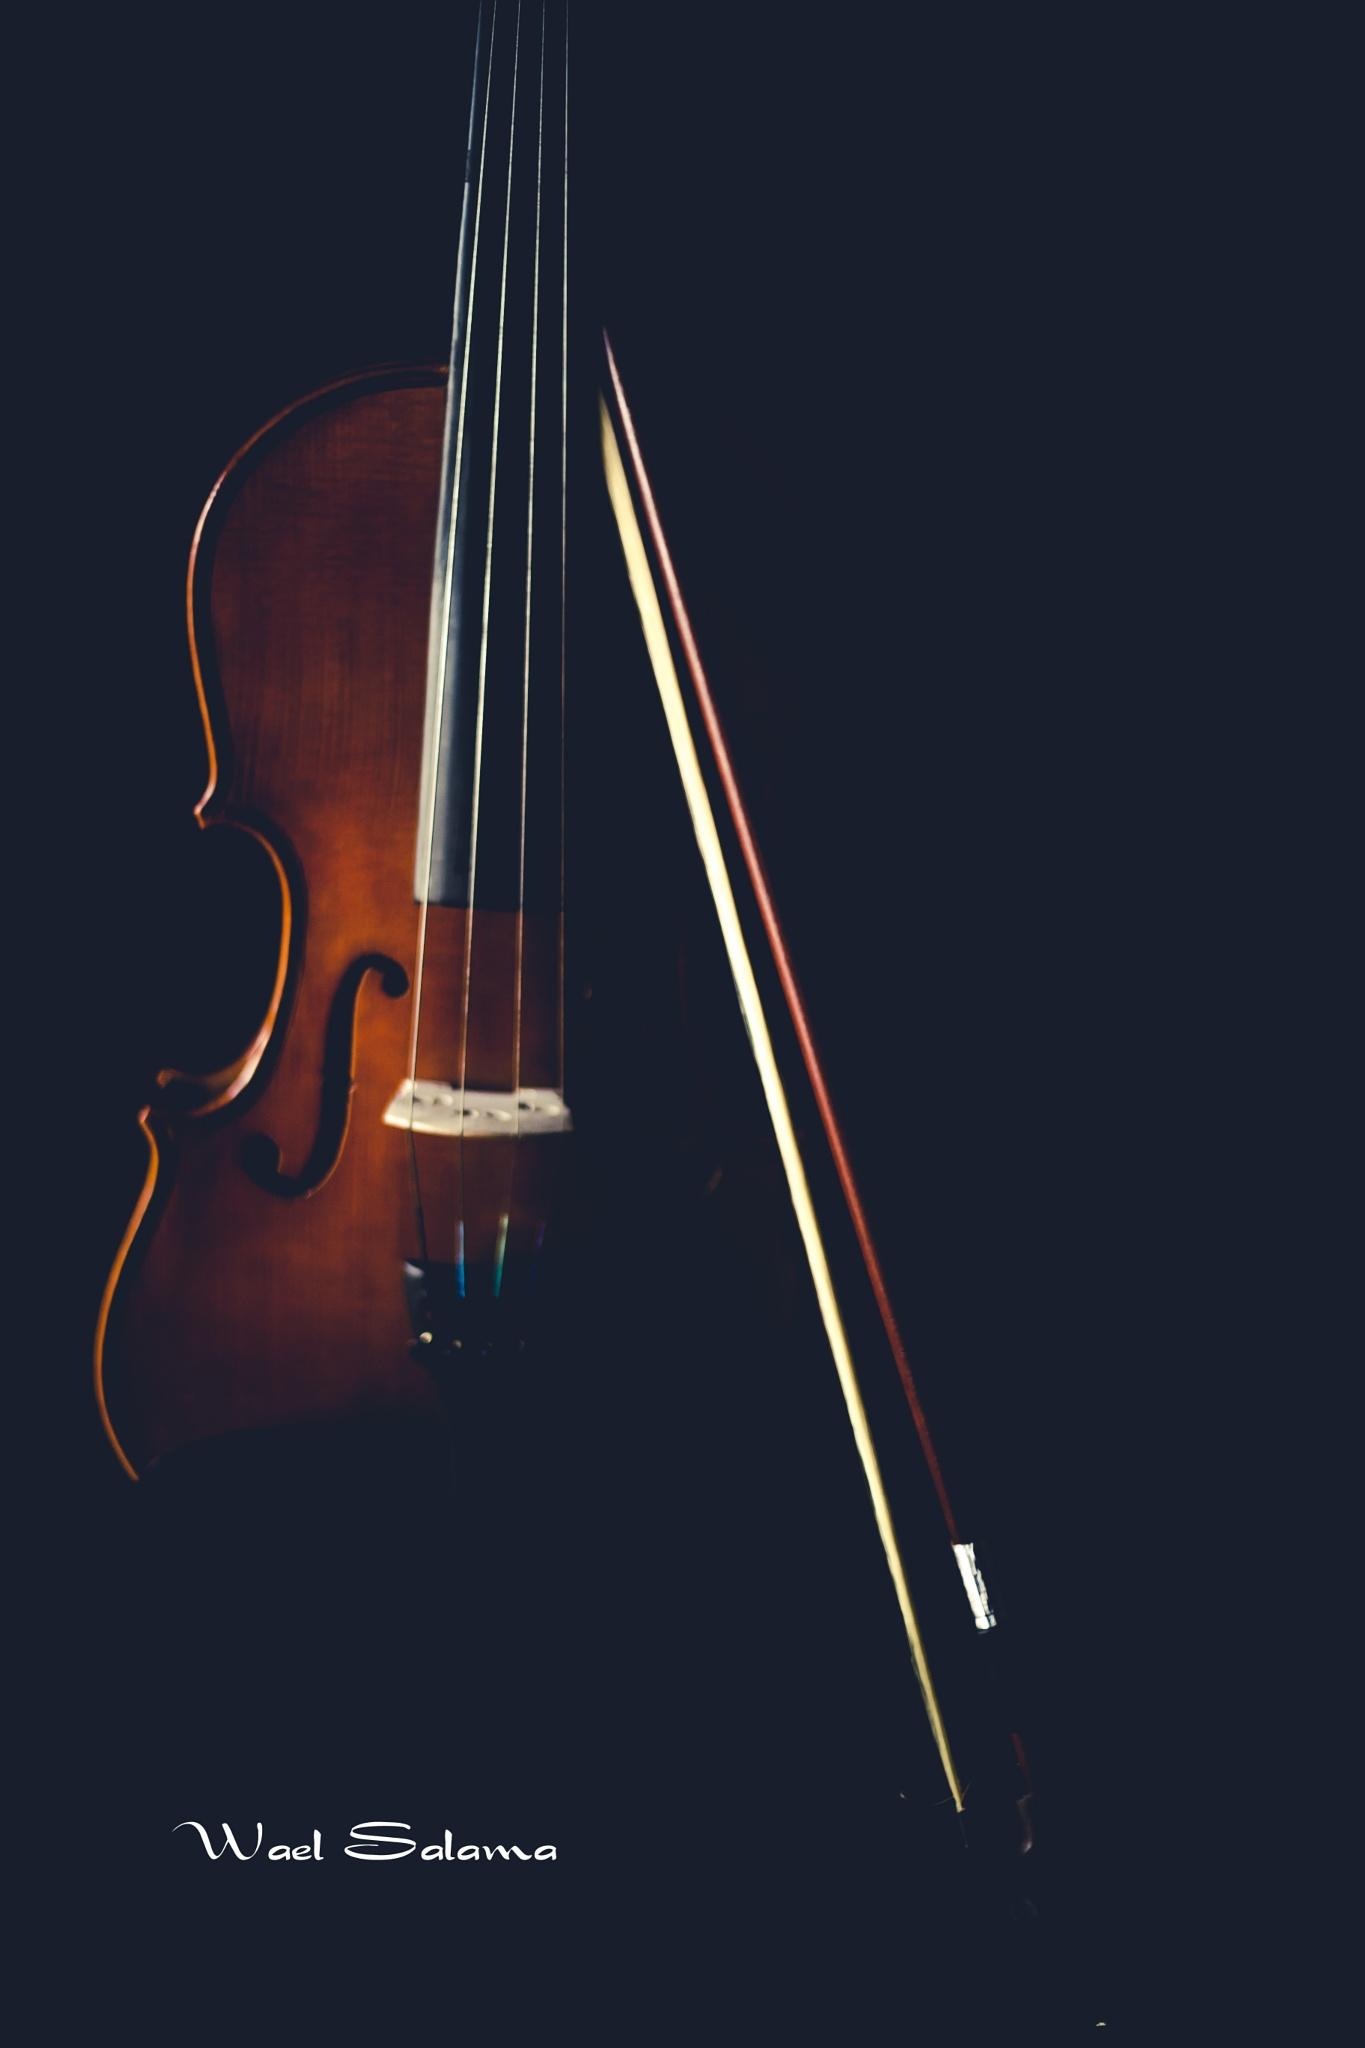 sense of music by Wael Salama